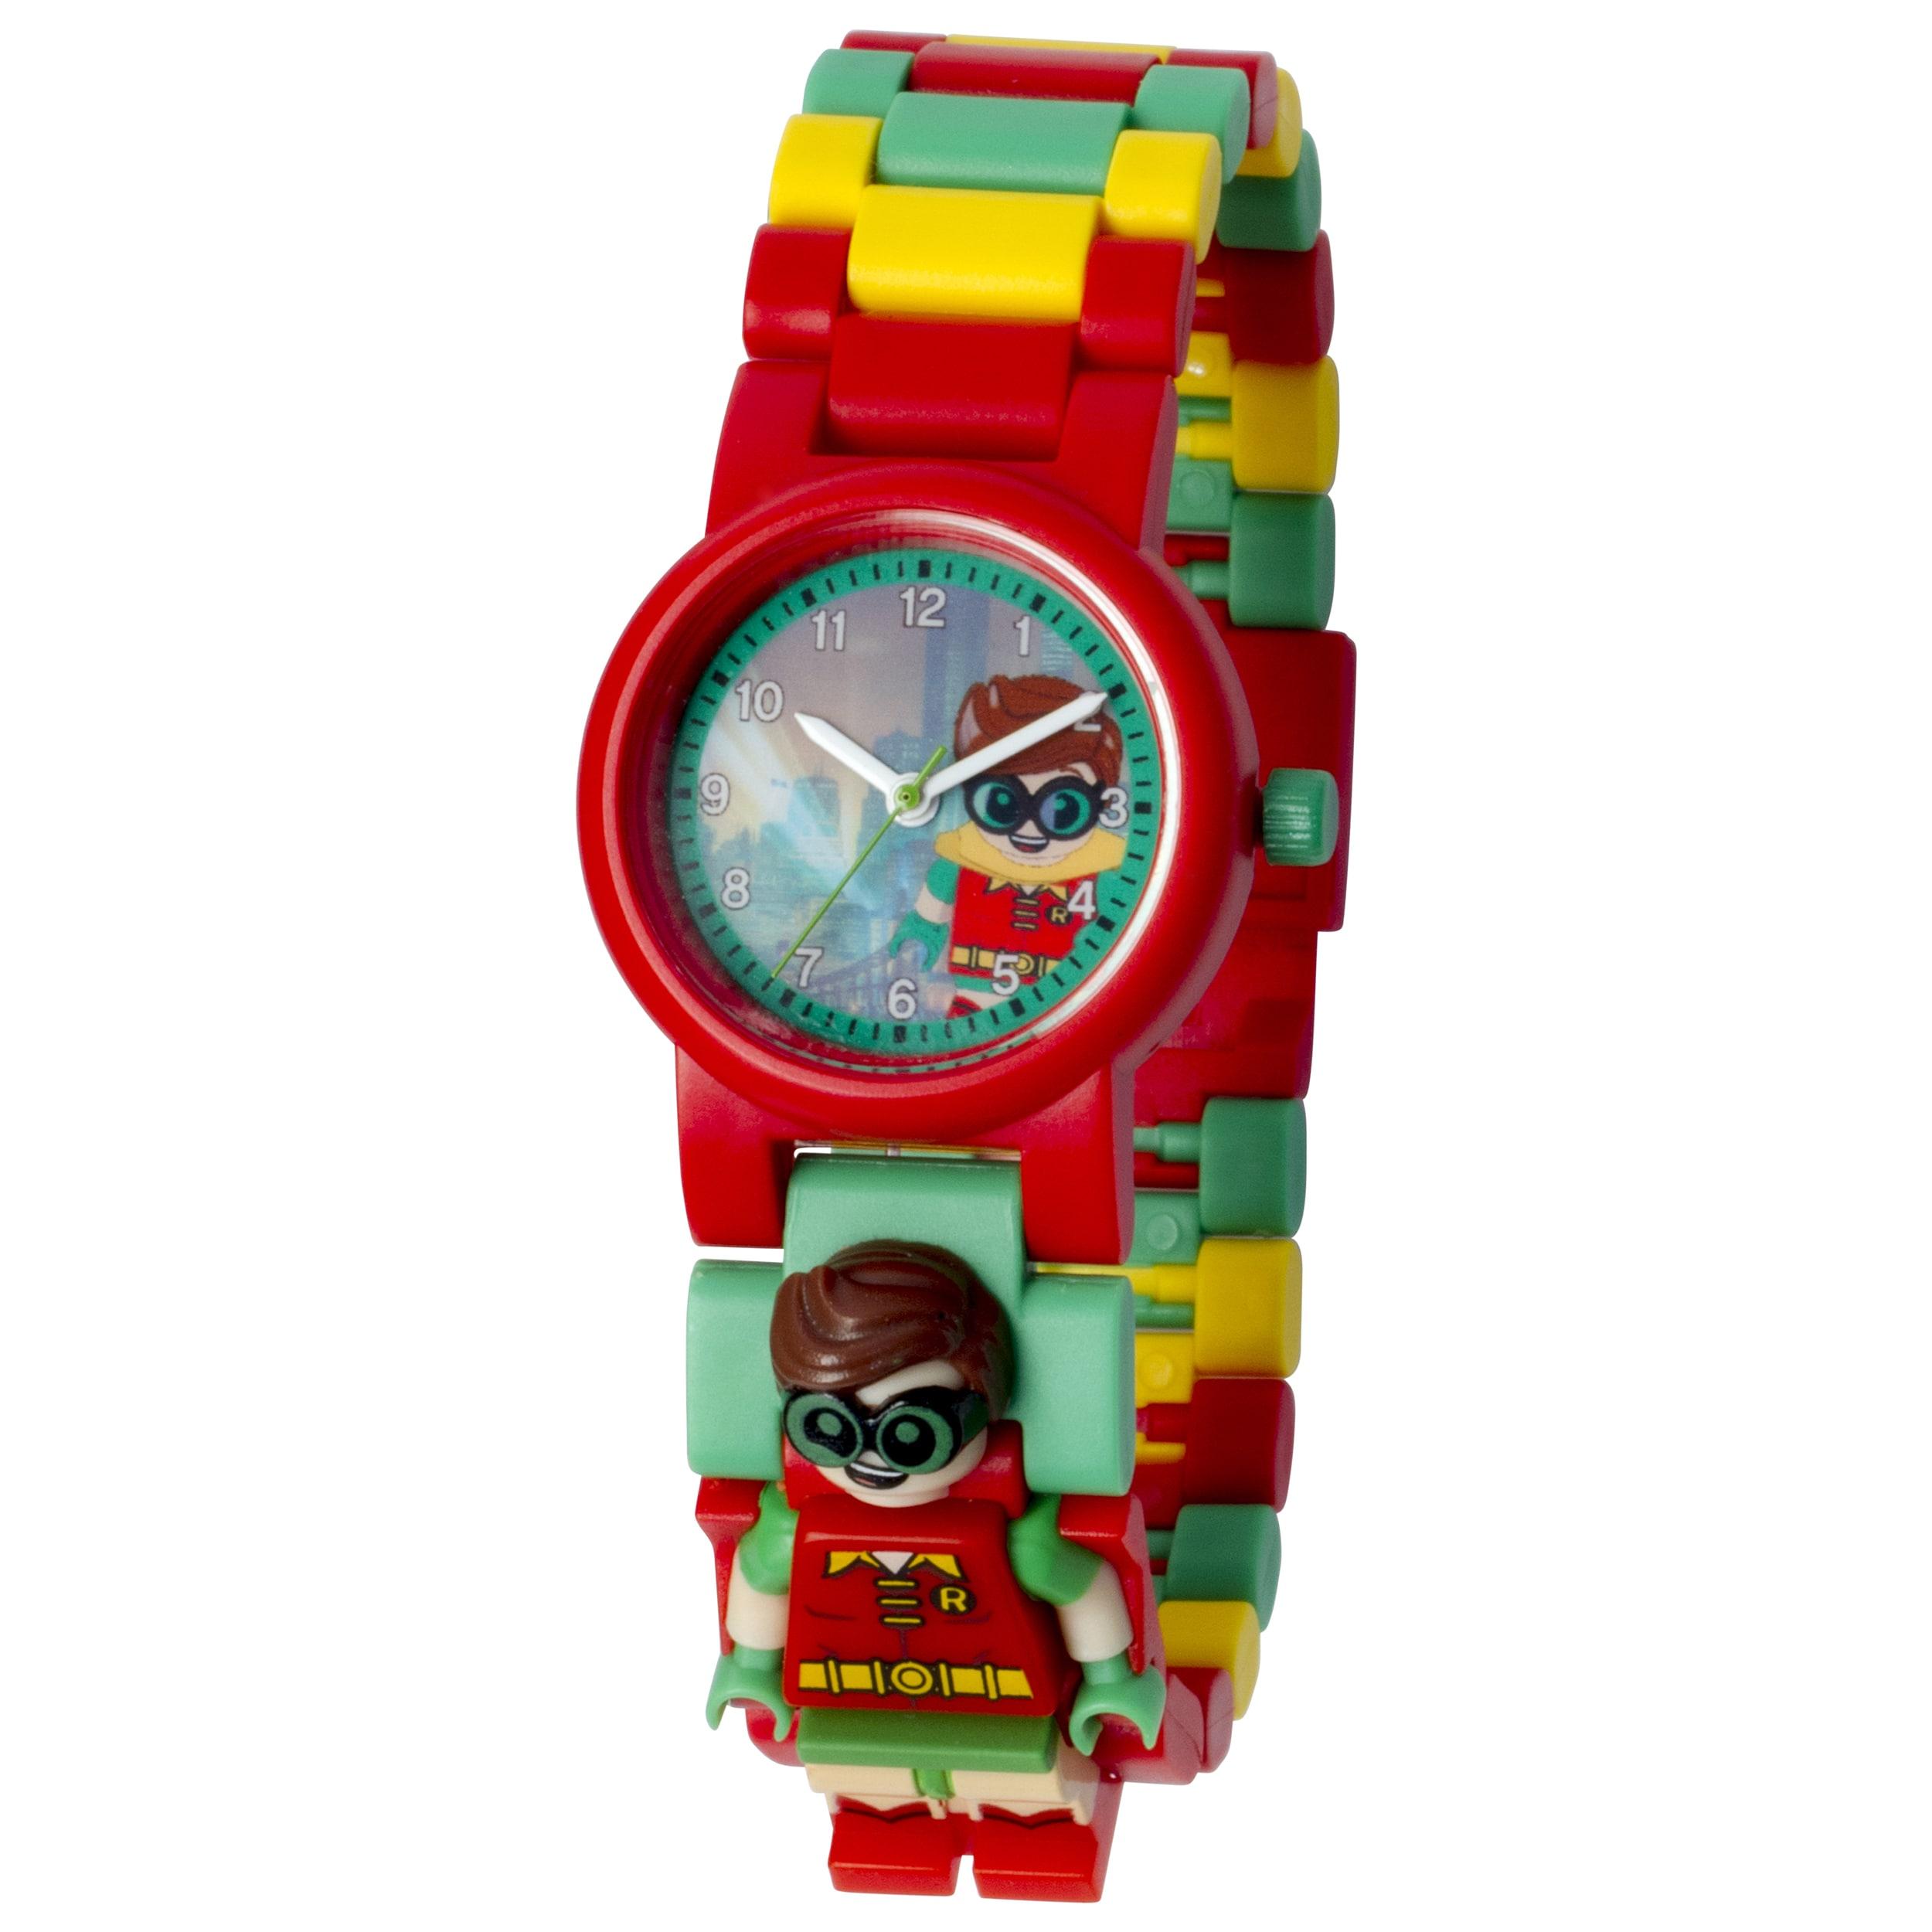 Lego Batman Movie 'Robin' Minifigure Link Watch (Red), Bo...